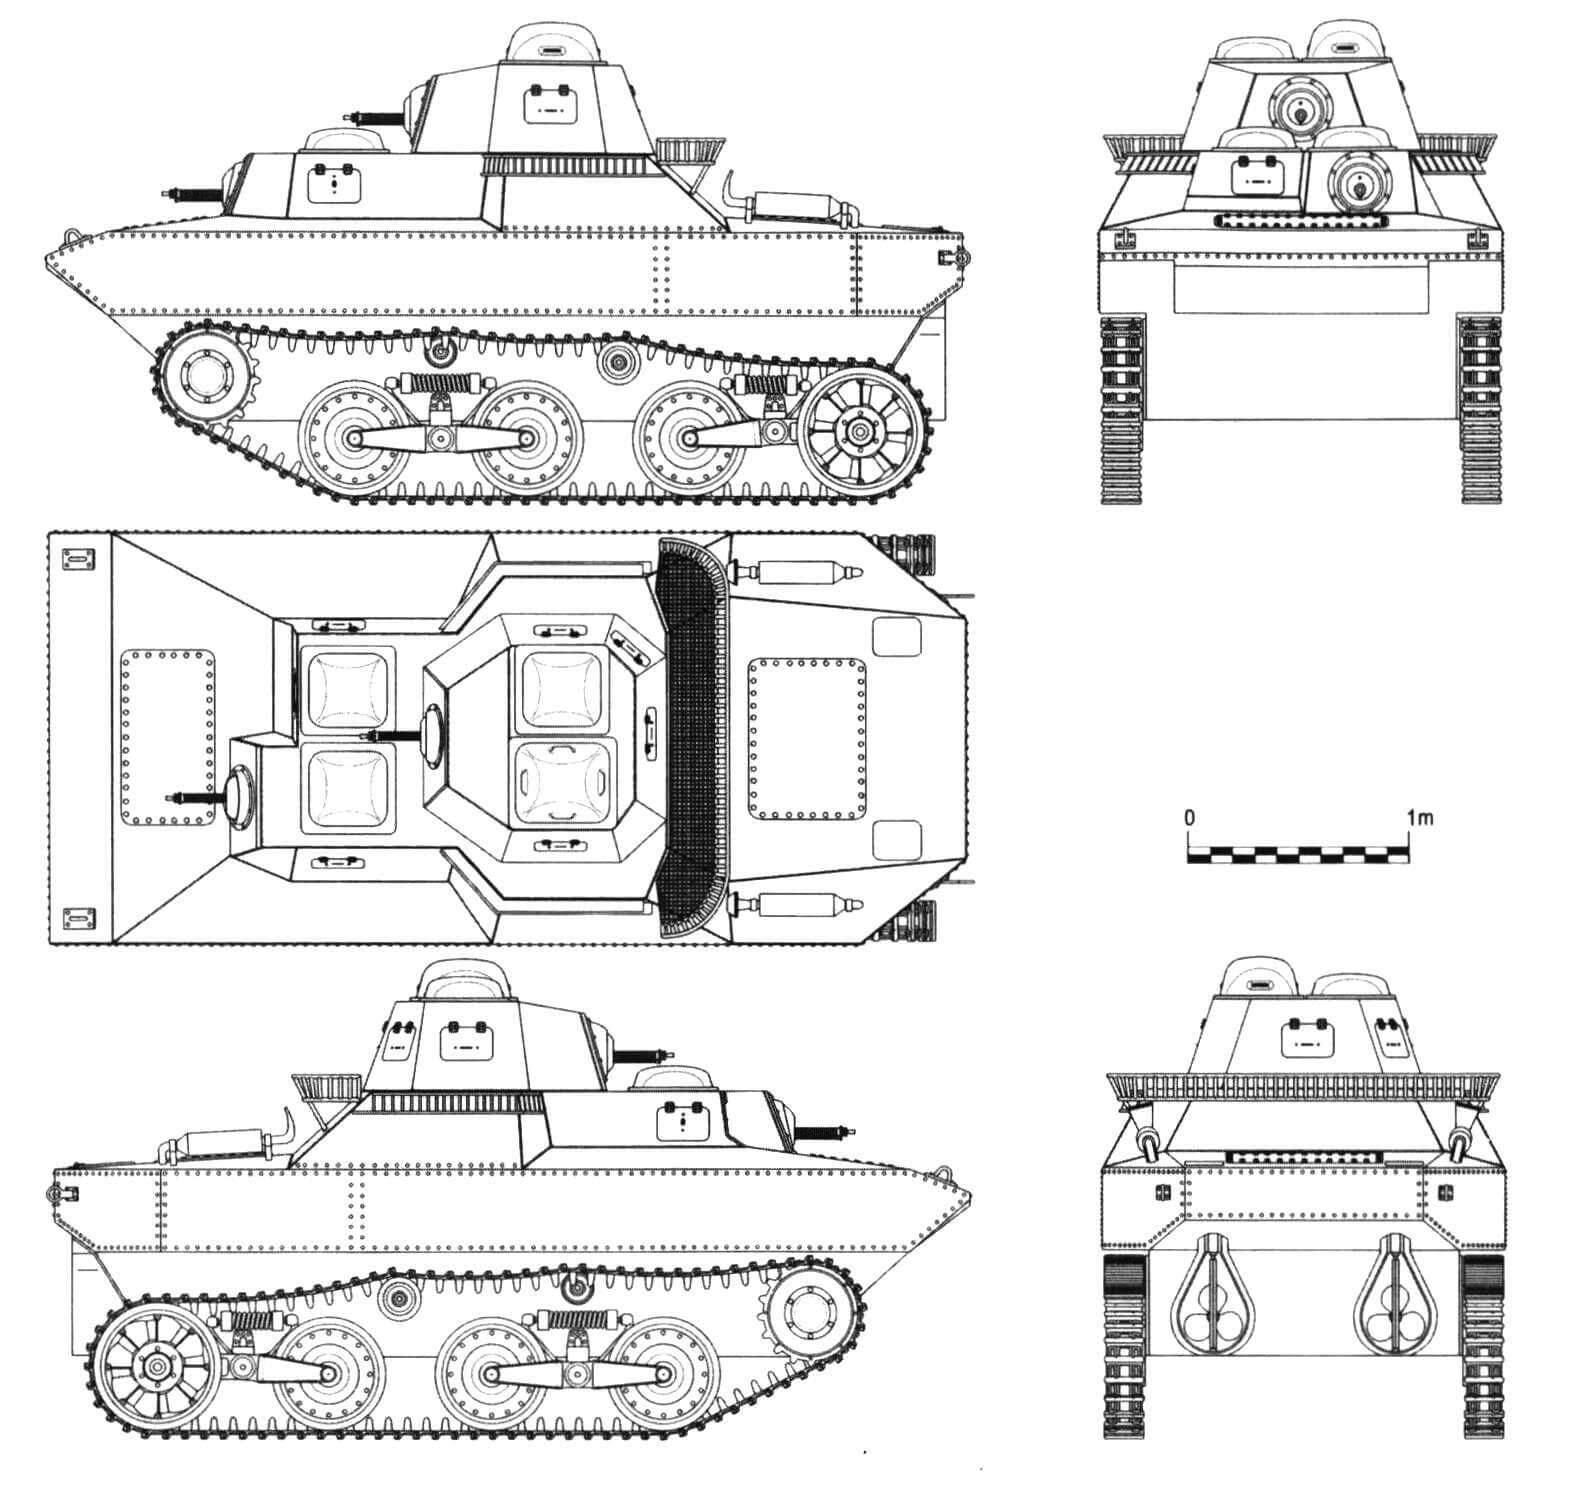 Плавающий танк фирмы «Ичикаджима» SR II